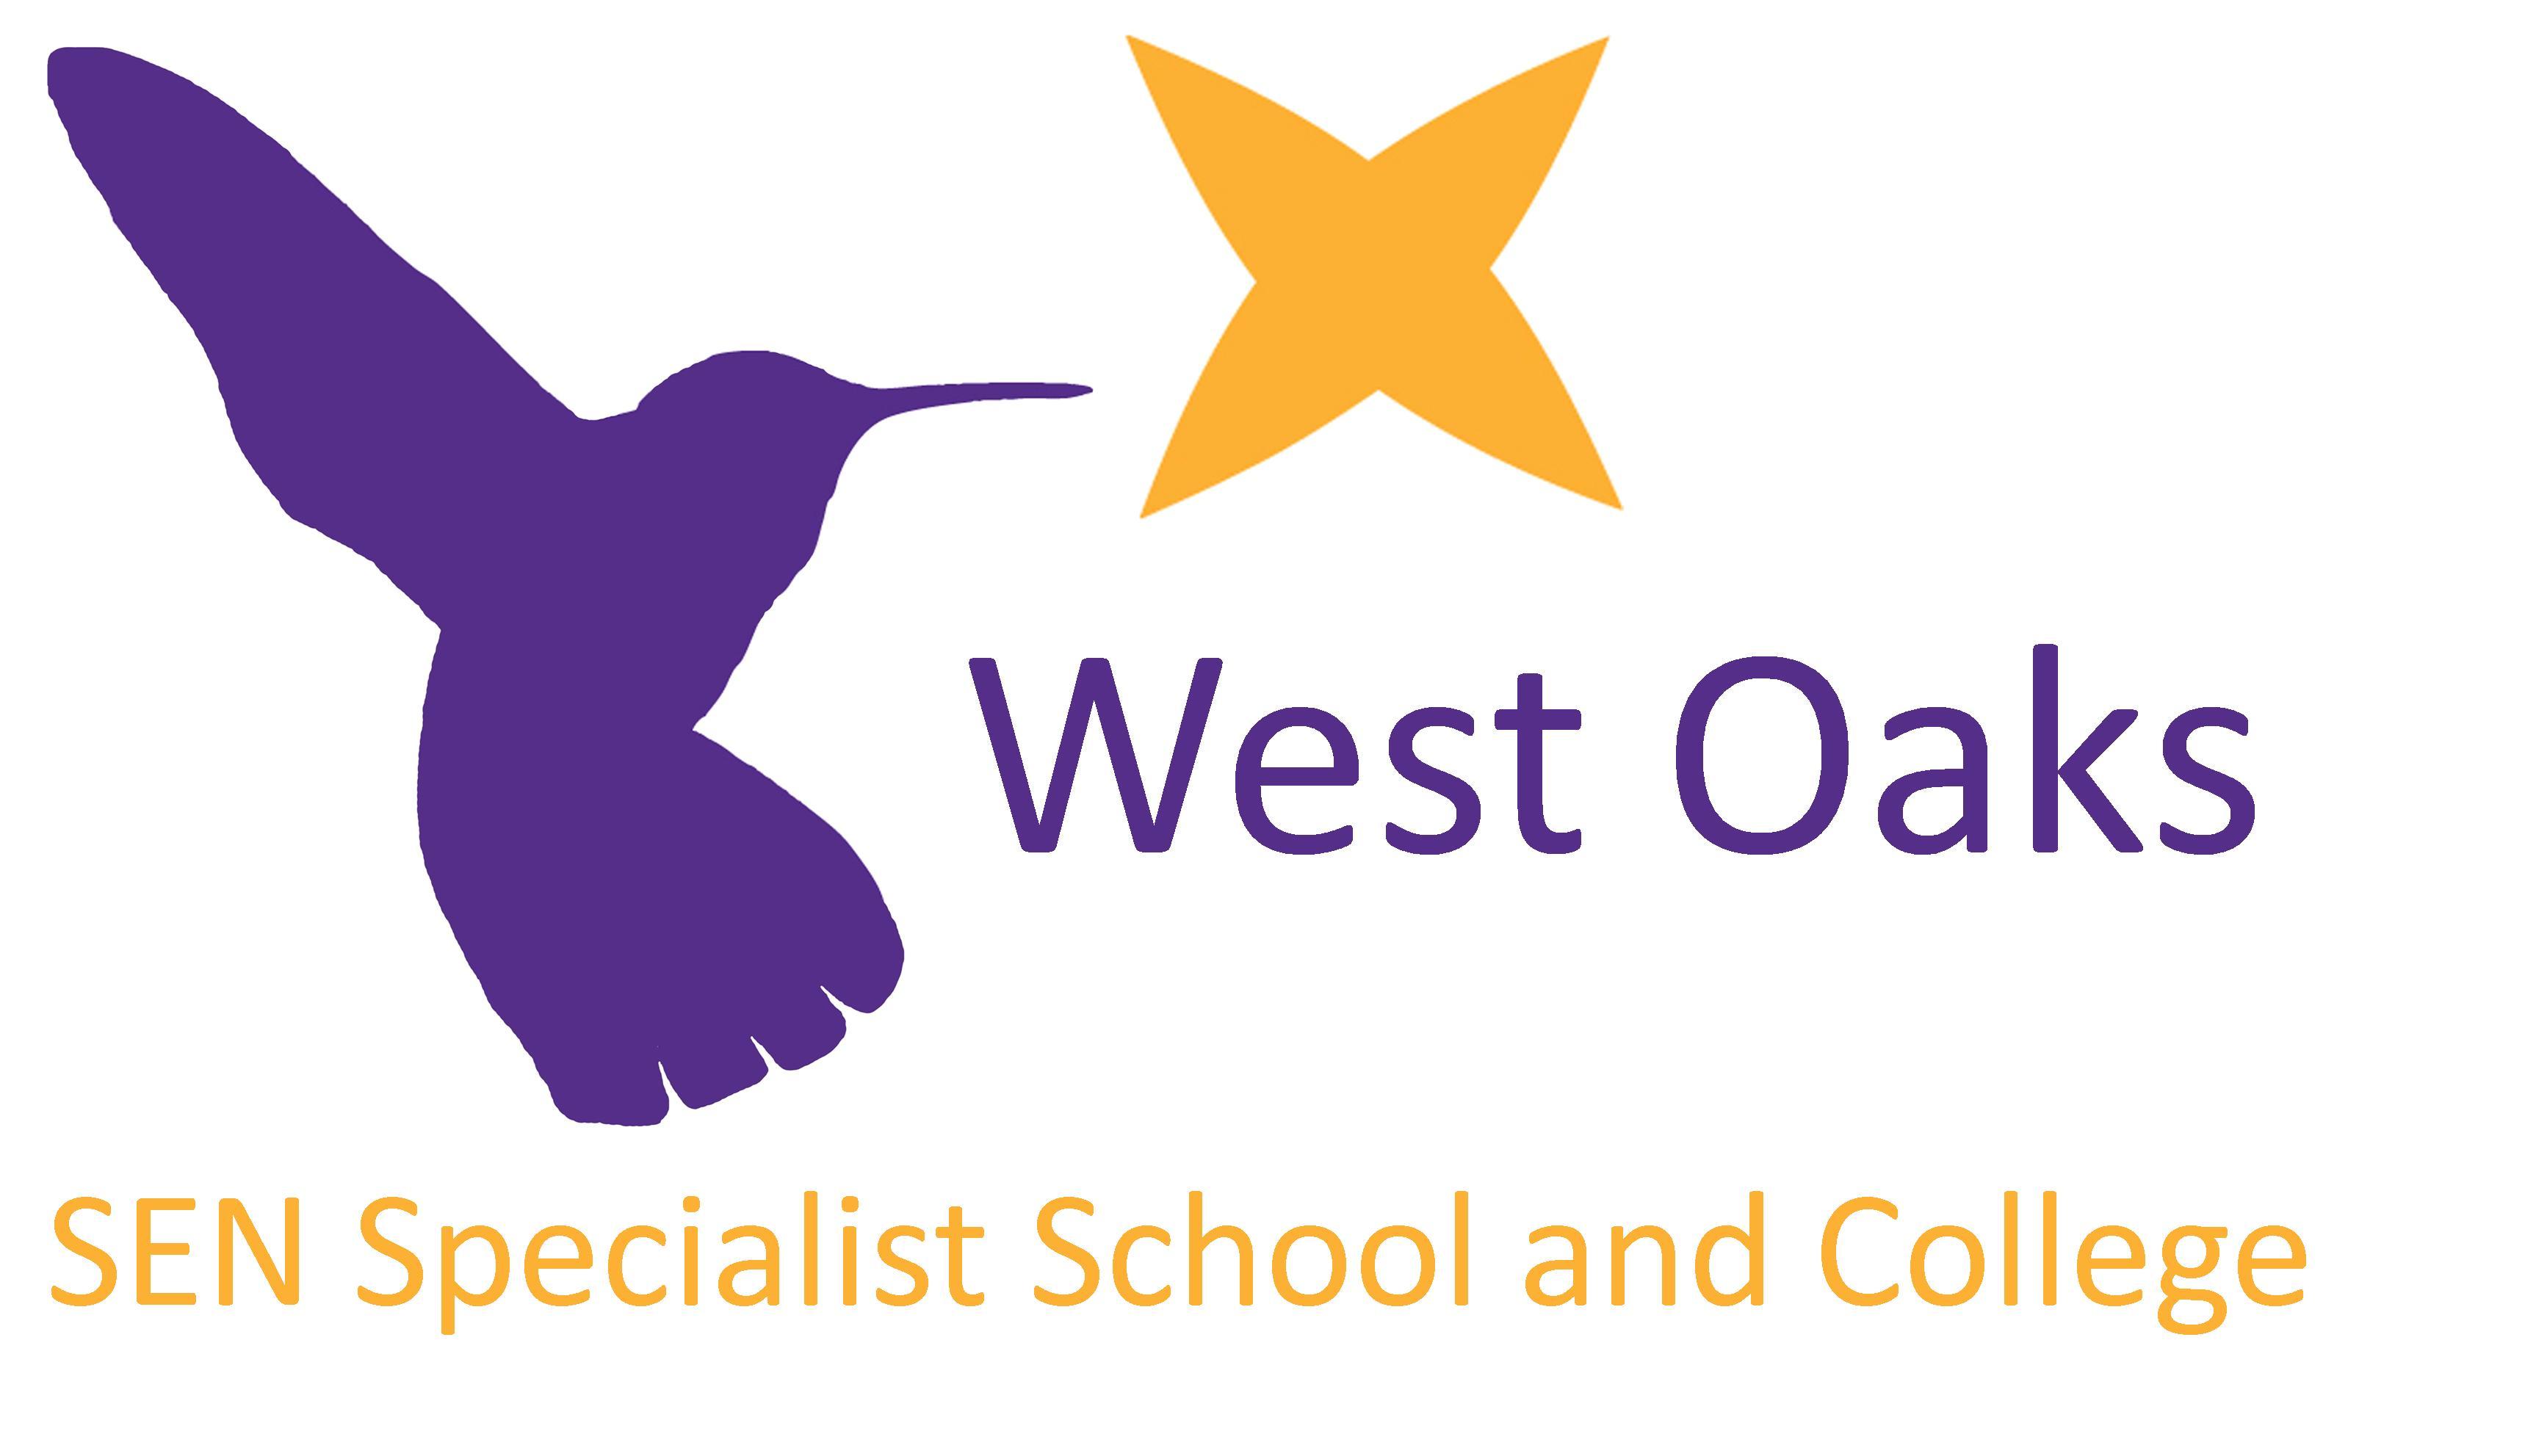 West Oaks SEN Specialist School and College Logo